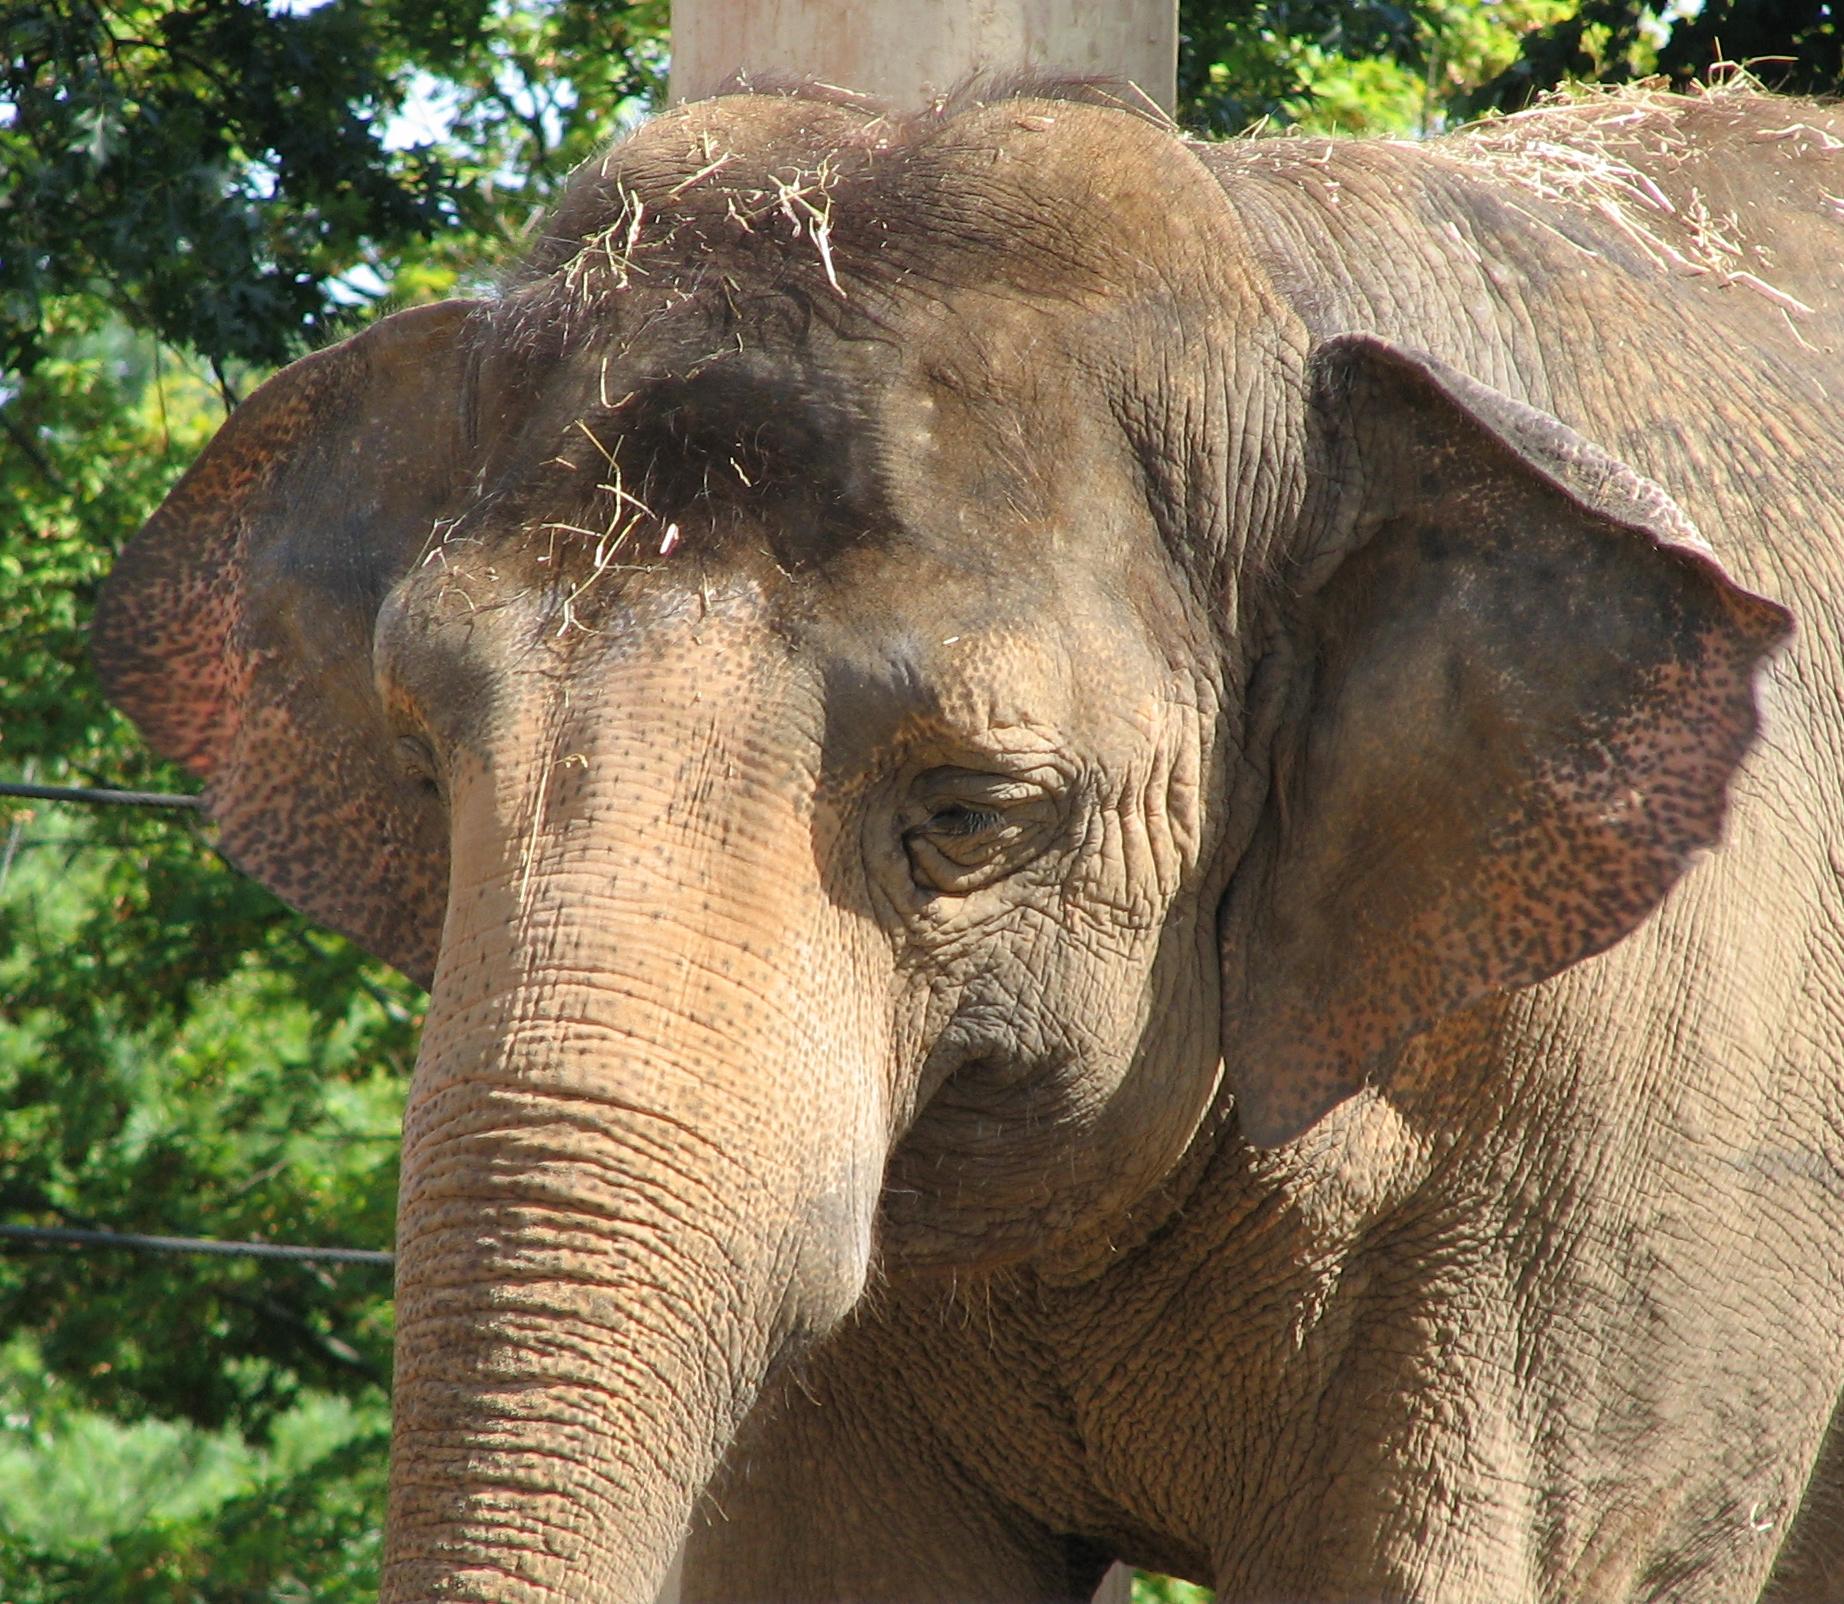 File:Asian Elephant Image 001.jpg - Wikipedia